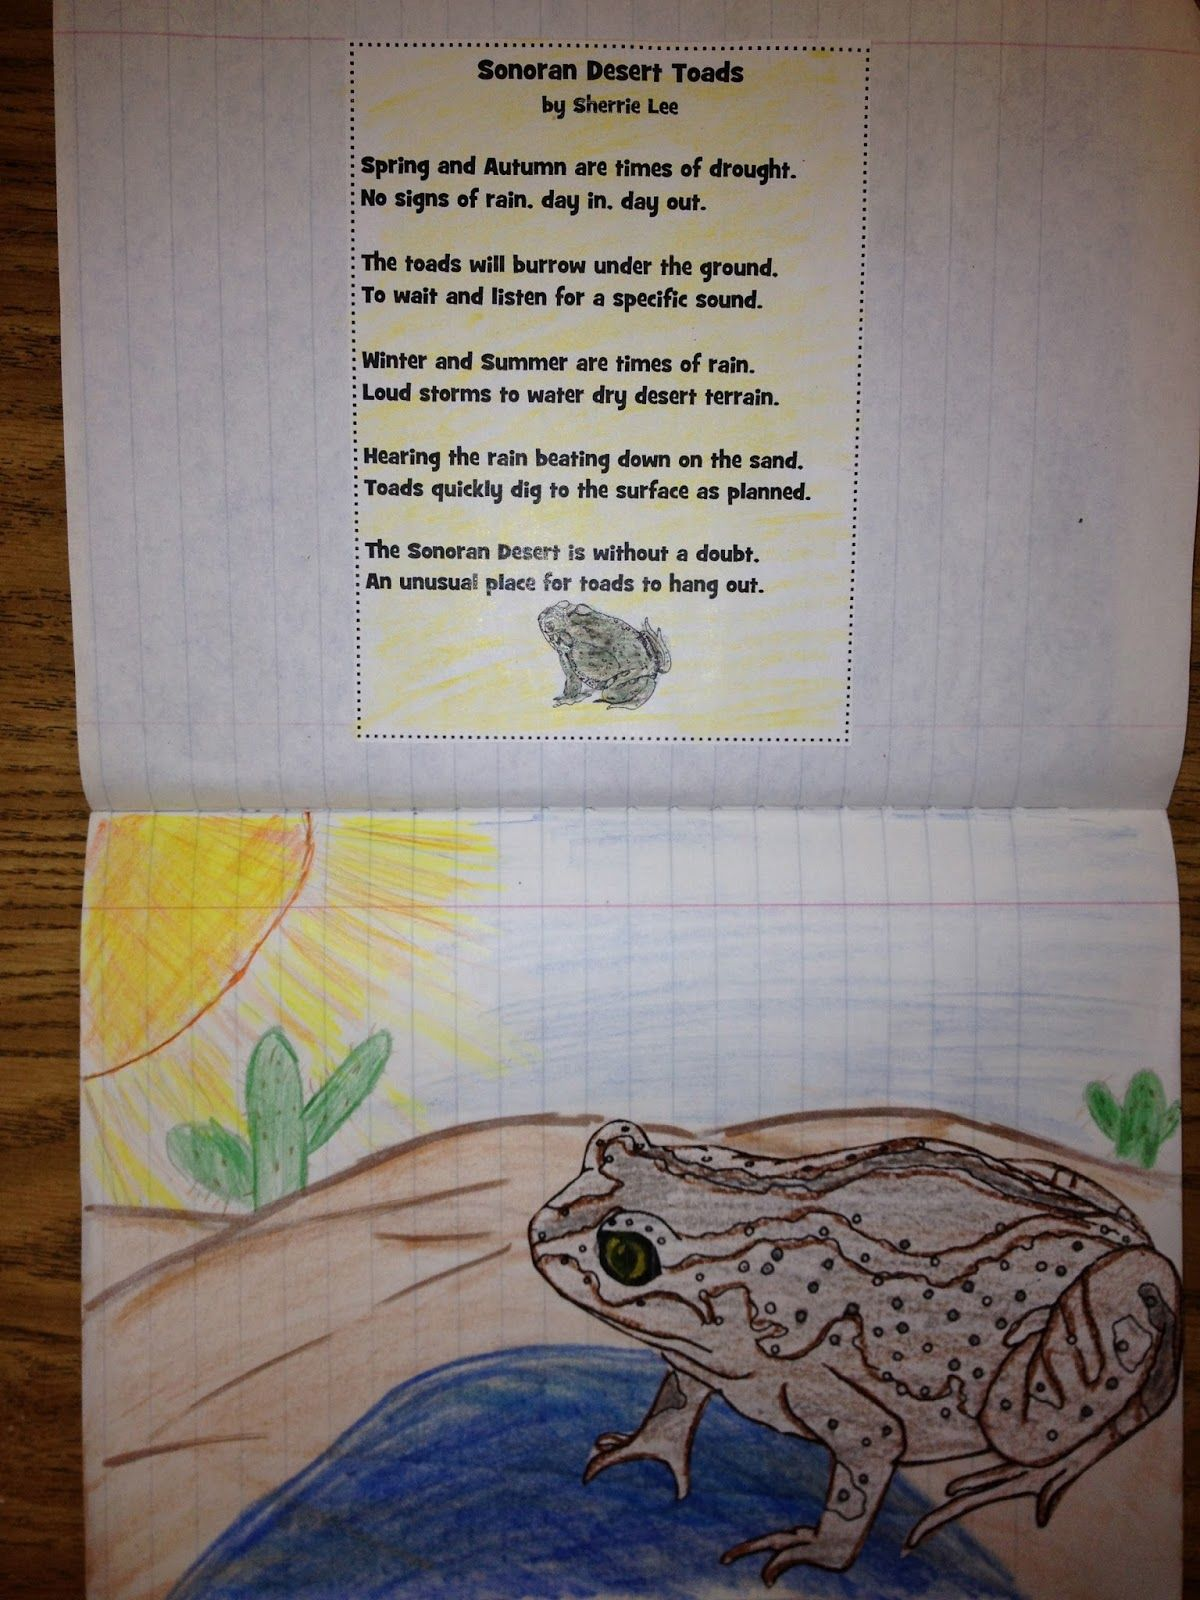 U5w1 Dig Wait Listen A Desert Toad S Tale Under The